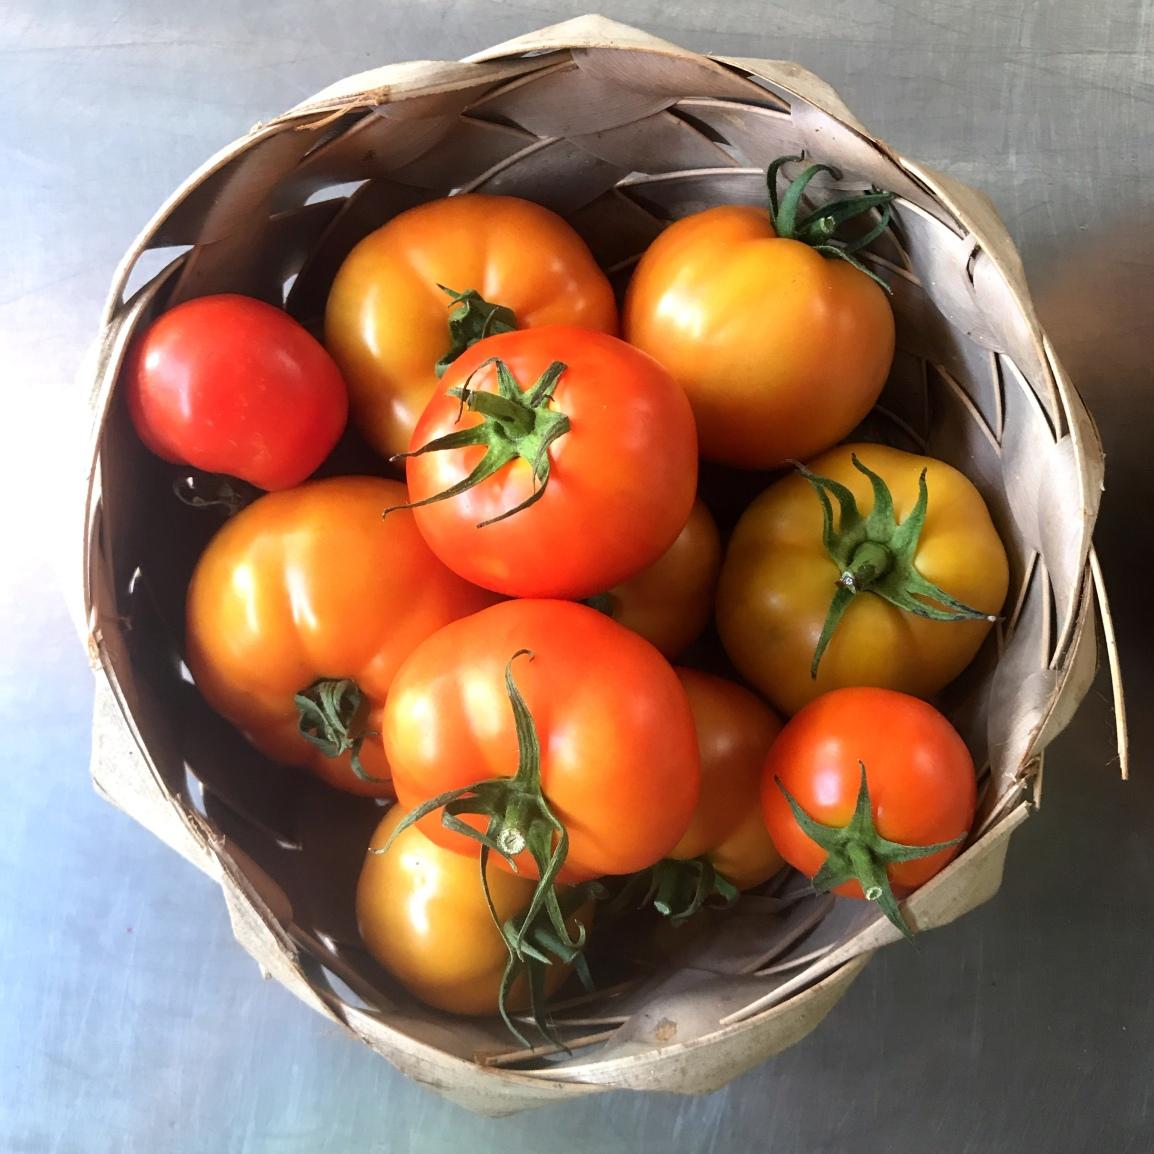 Wednesday ARTfarm Produce Pickups 1/6/2021: Toh-MAH-tohz(corrected)